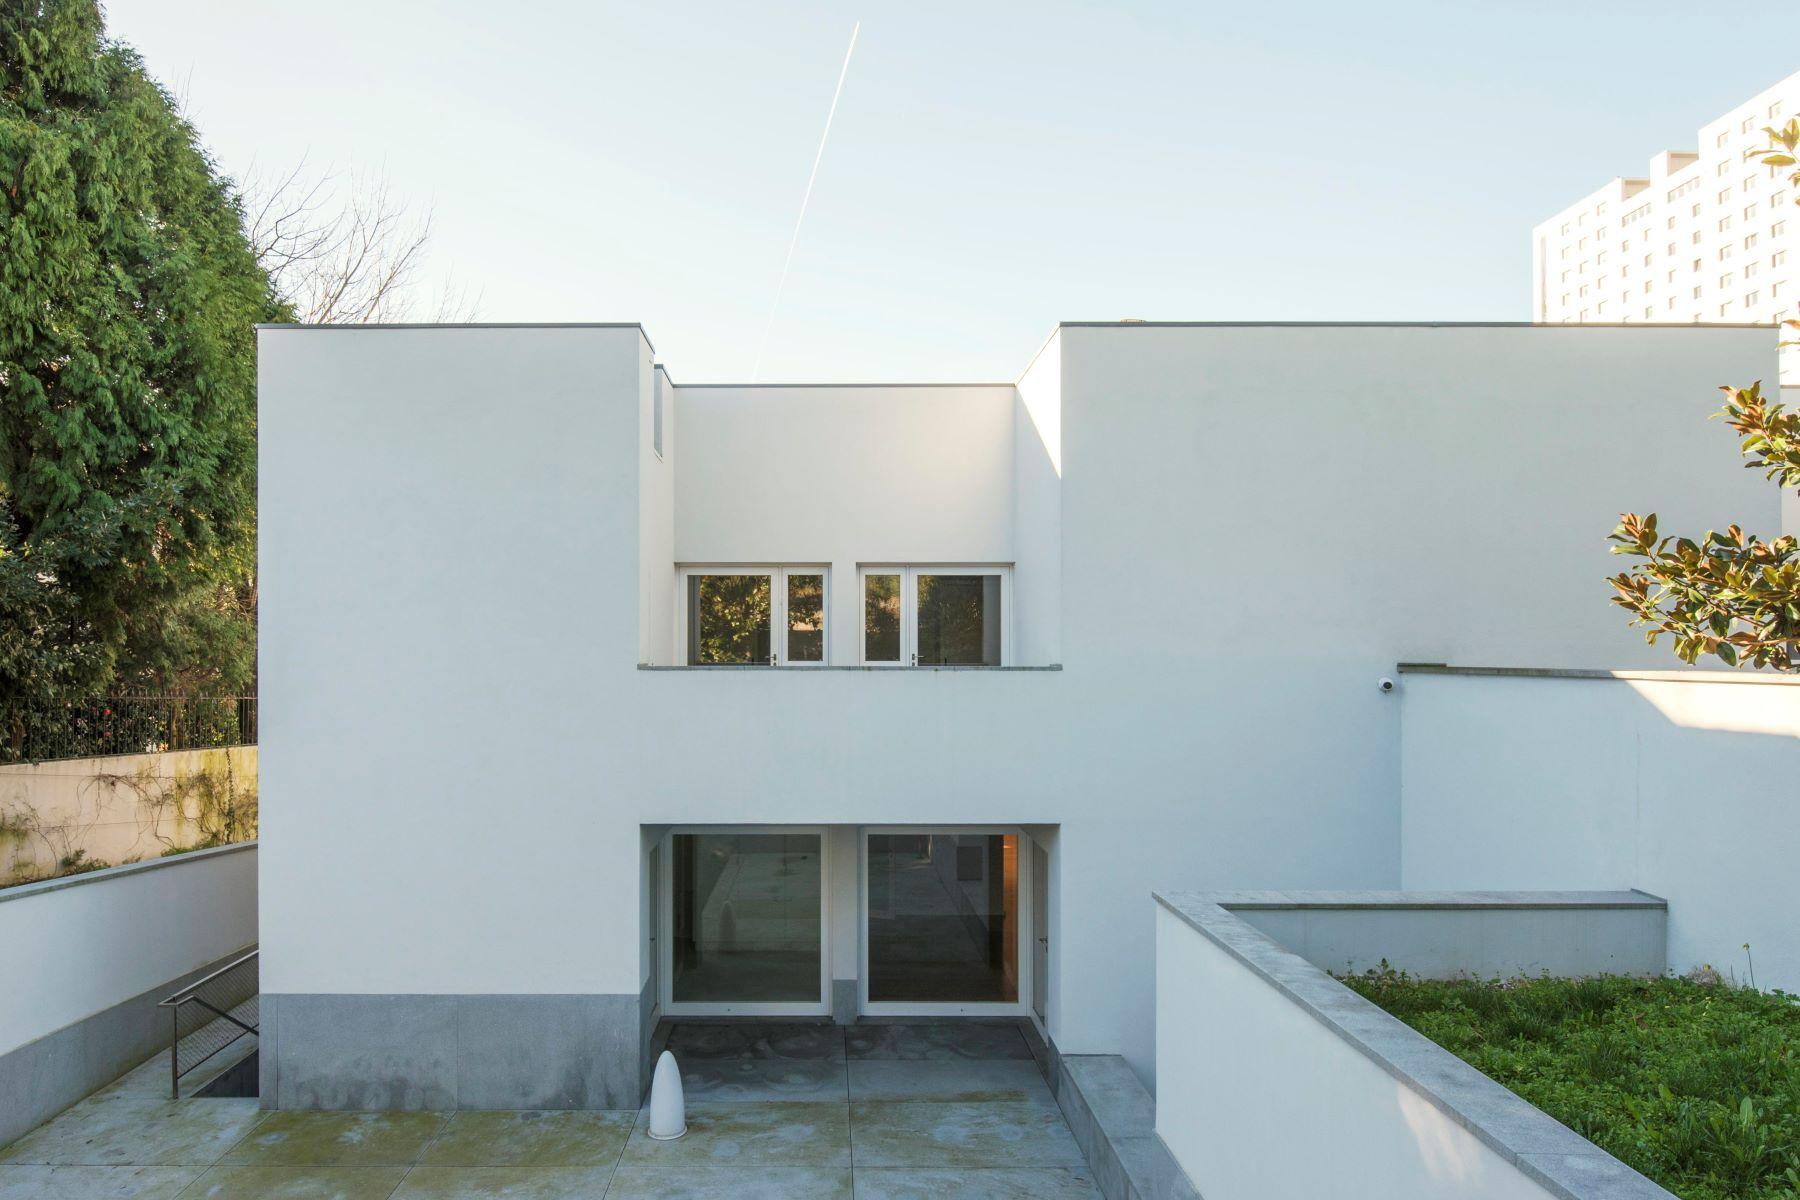 独户住宅 为 销售 在 Semi-detached house, 5 bedrooms, for Sale 波尔图, 波尔图, 葡萄牙